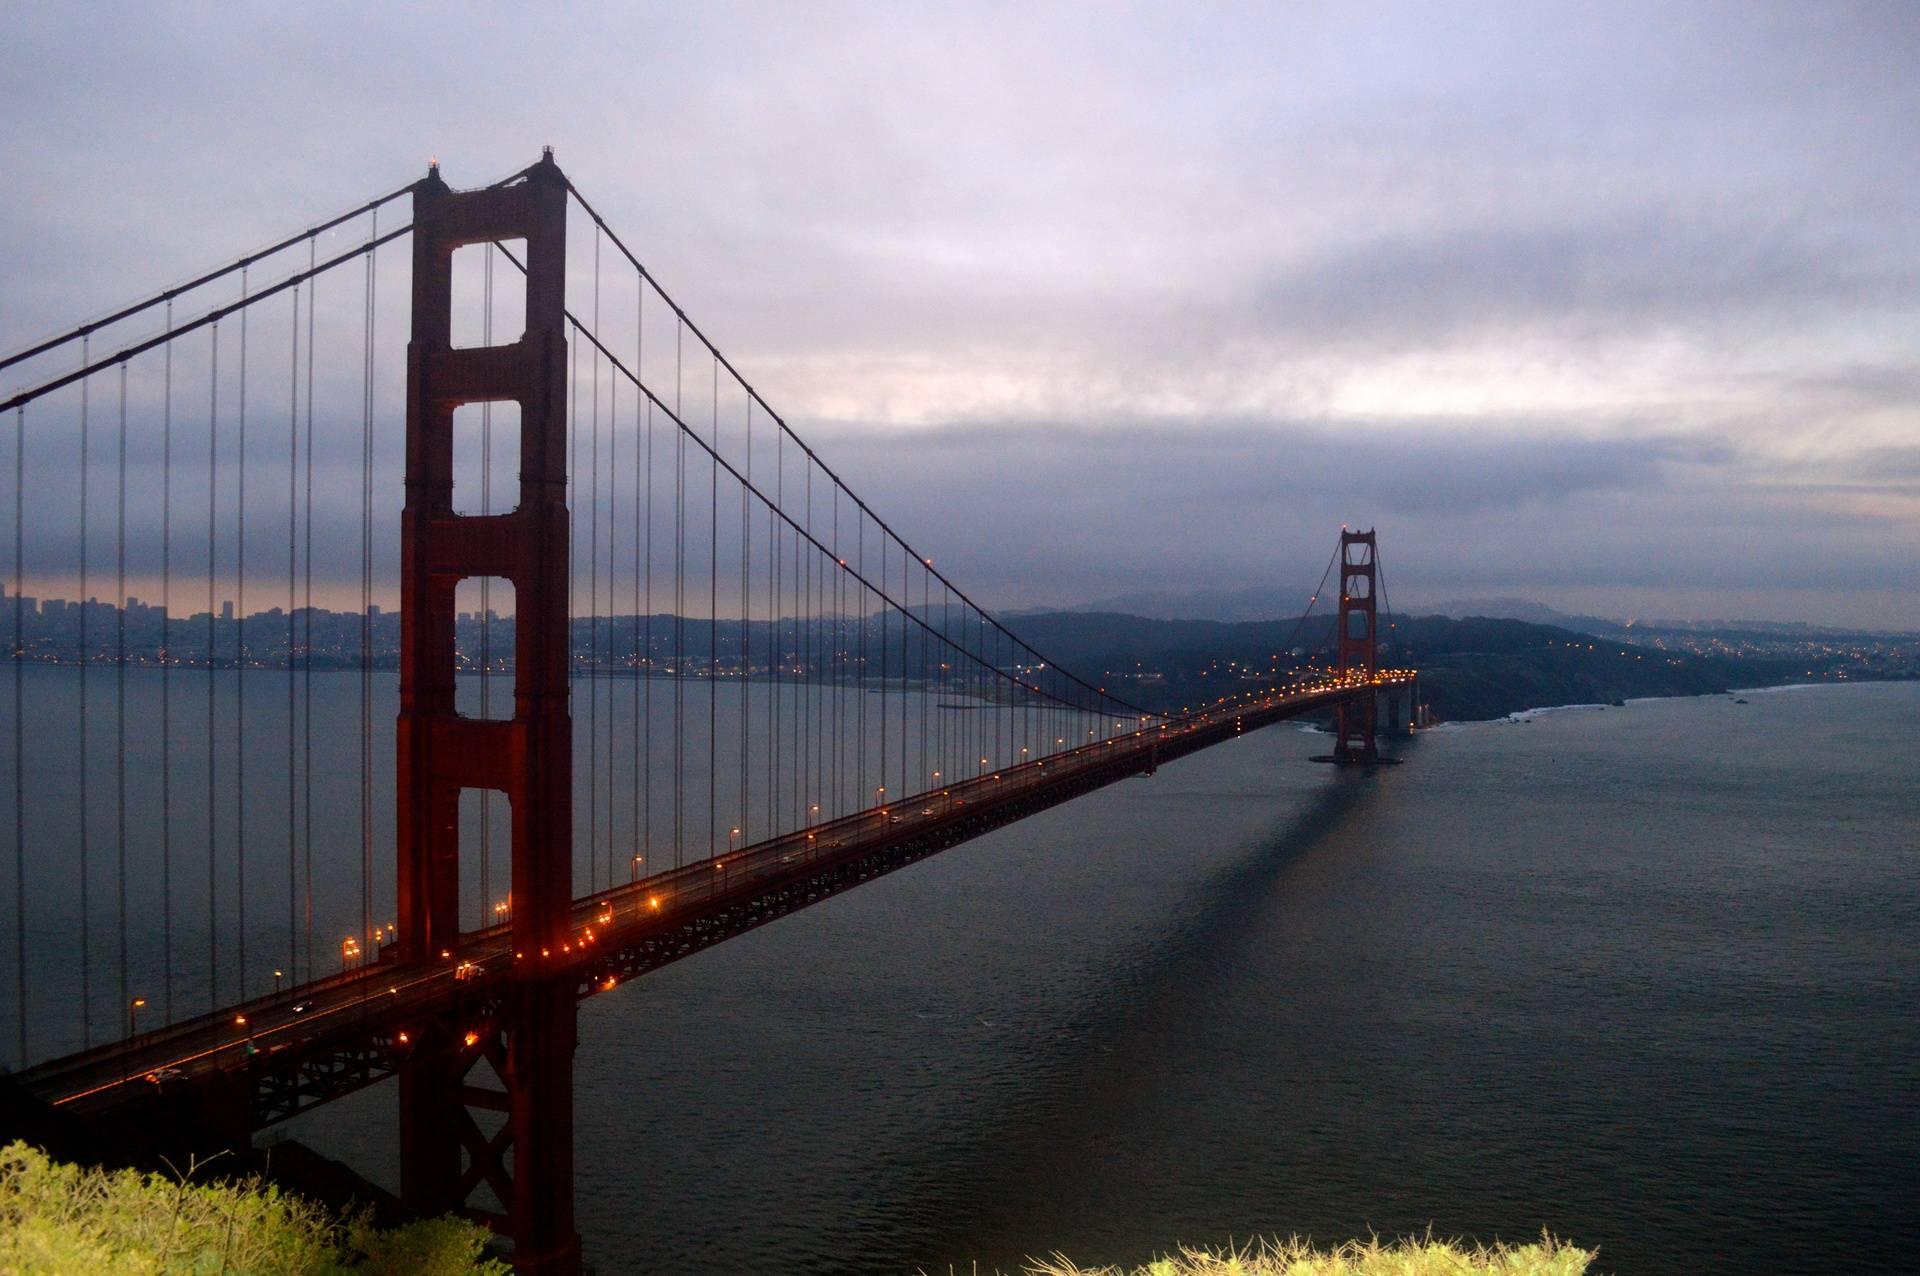 Lavender Sky over the Golden Gate